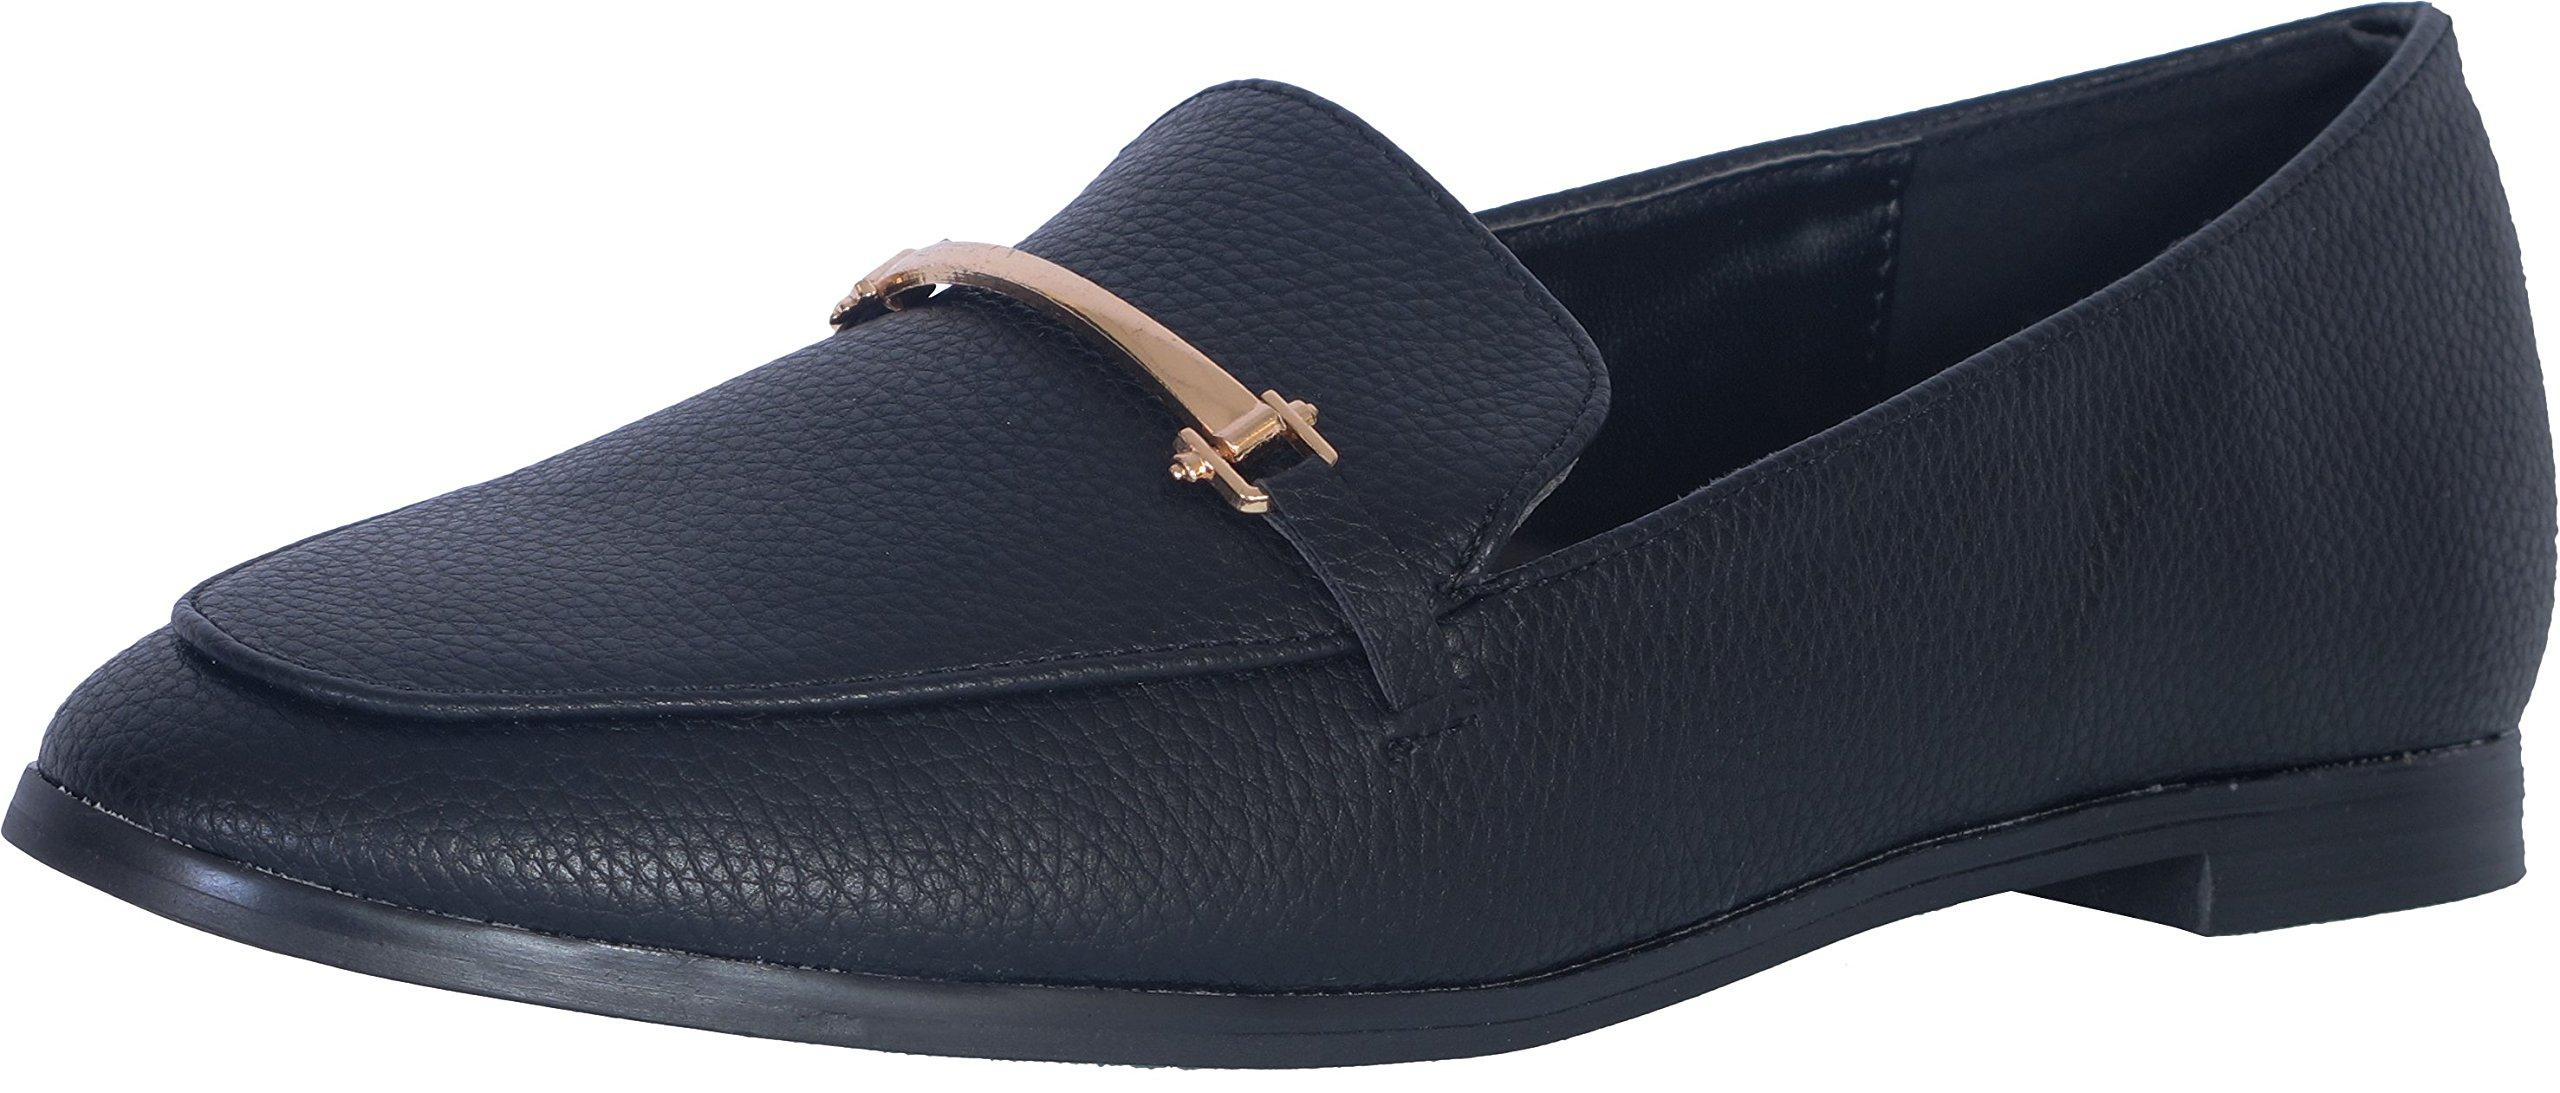 Catherine Malandrino Women's Slip-On Loafer, Black, 6.5 B(M) US' by Catherine Malandrino